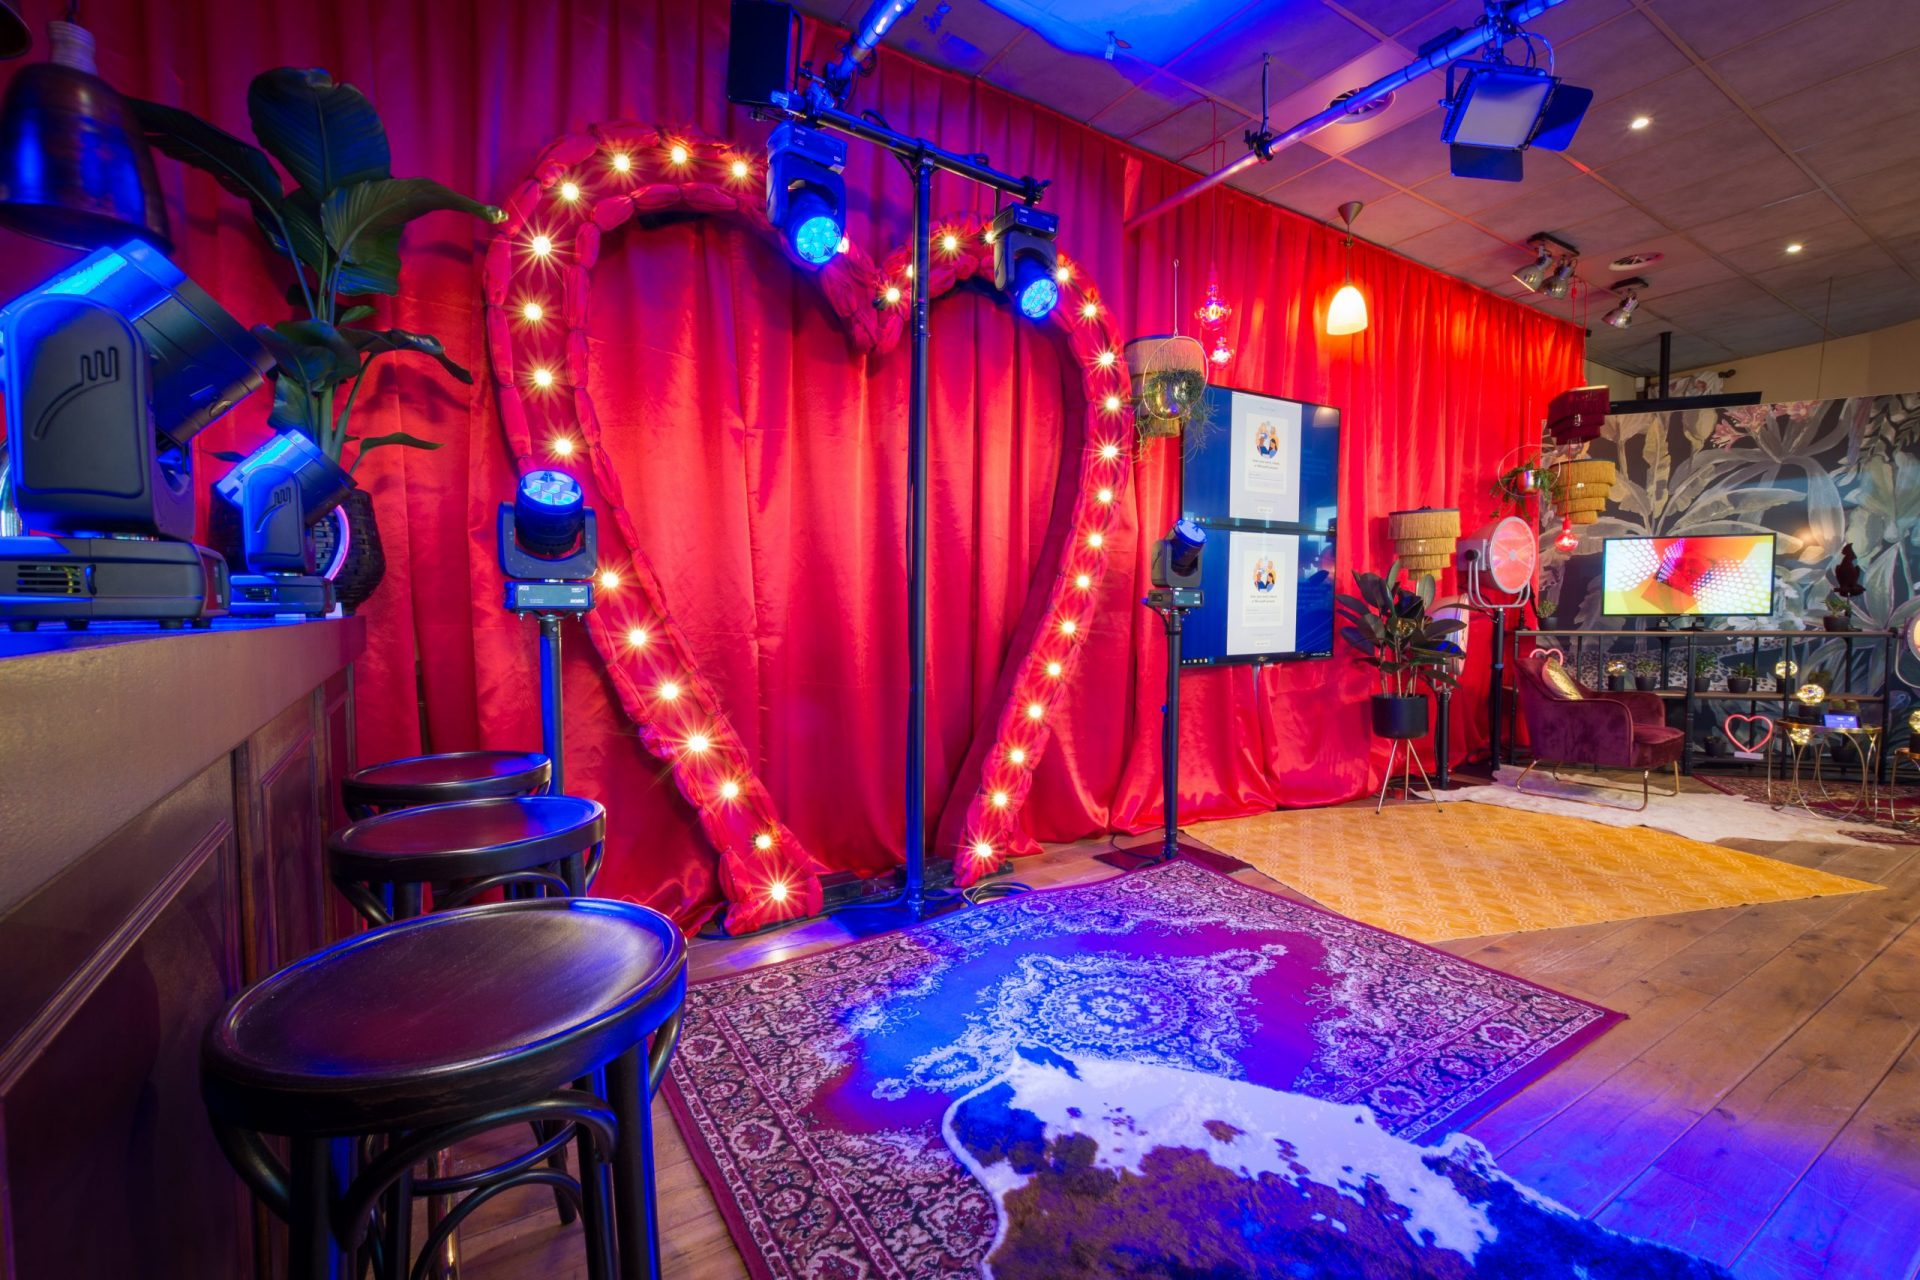 Hazes in Studio A2 Cafe Breukelen (2)